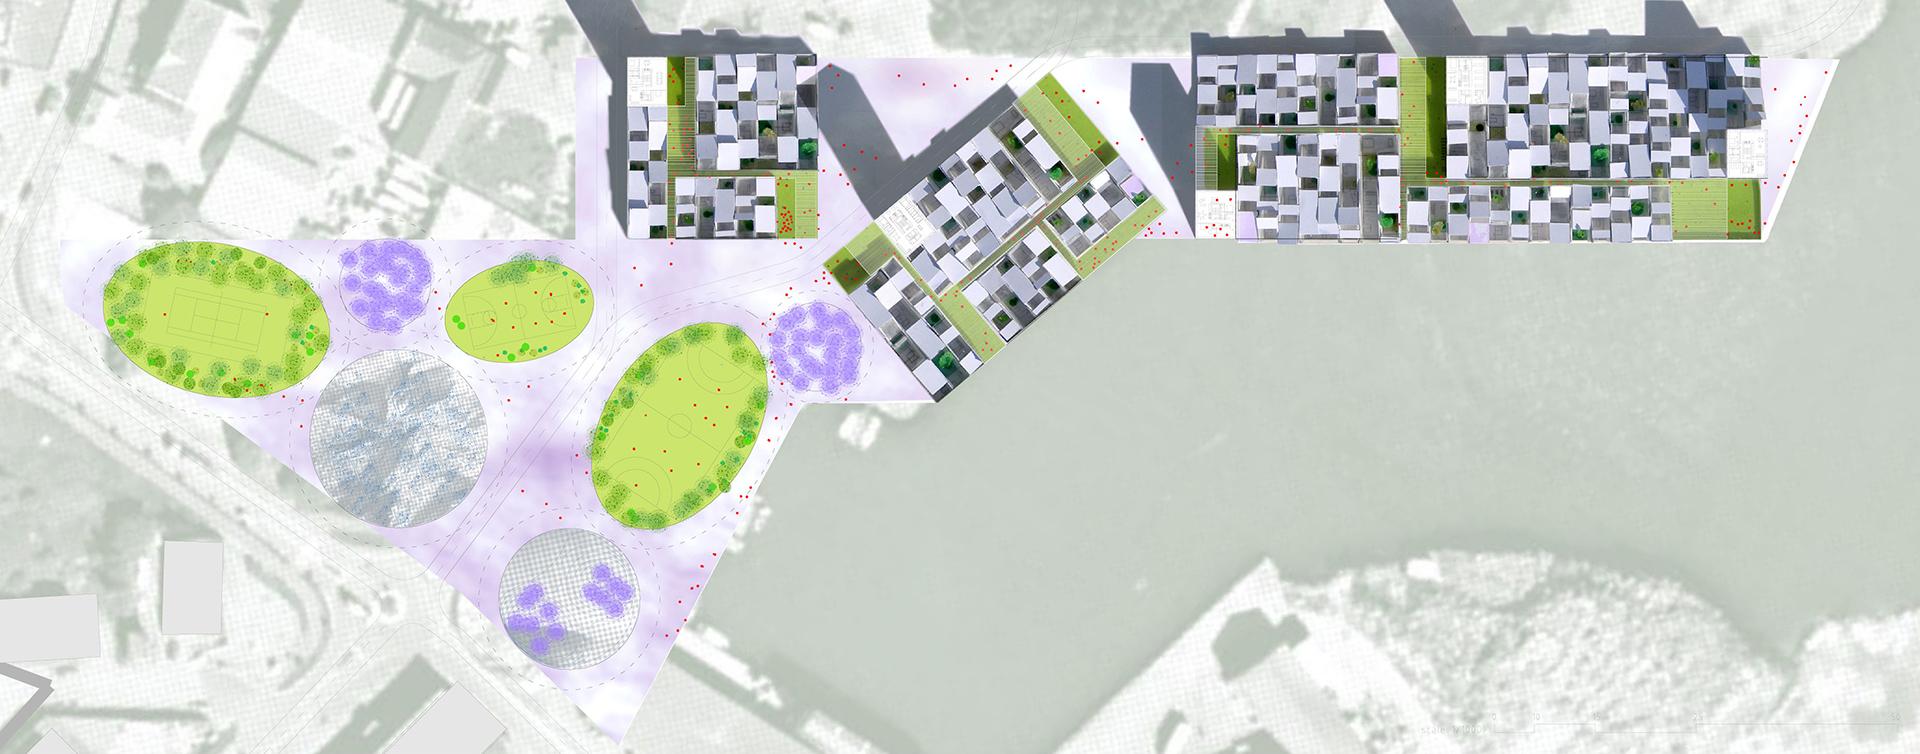 02_PLAYstudio-stavanger-lervig-housing